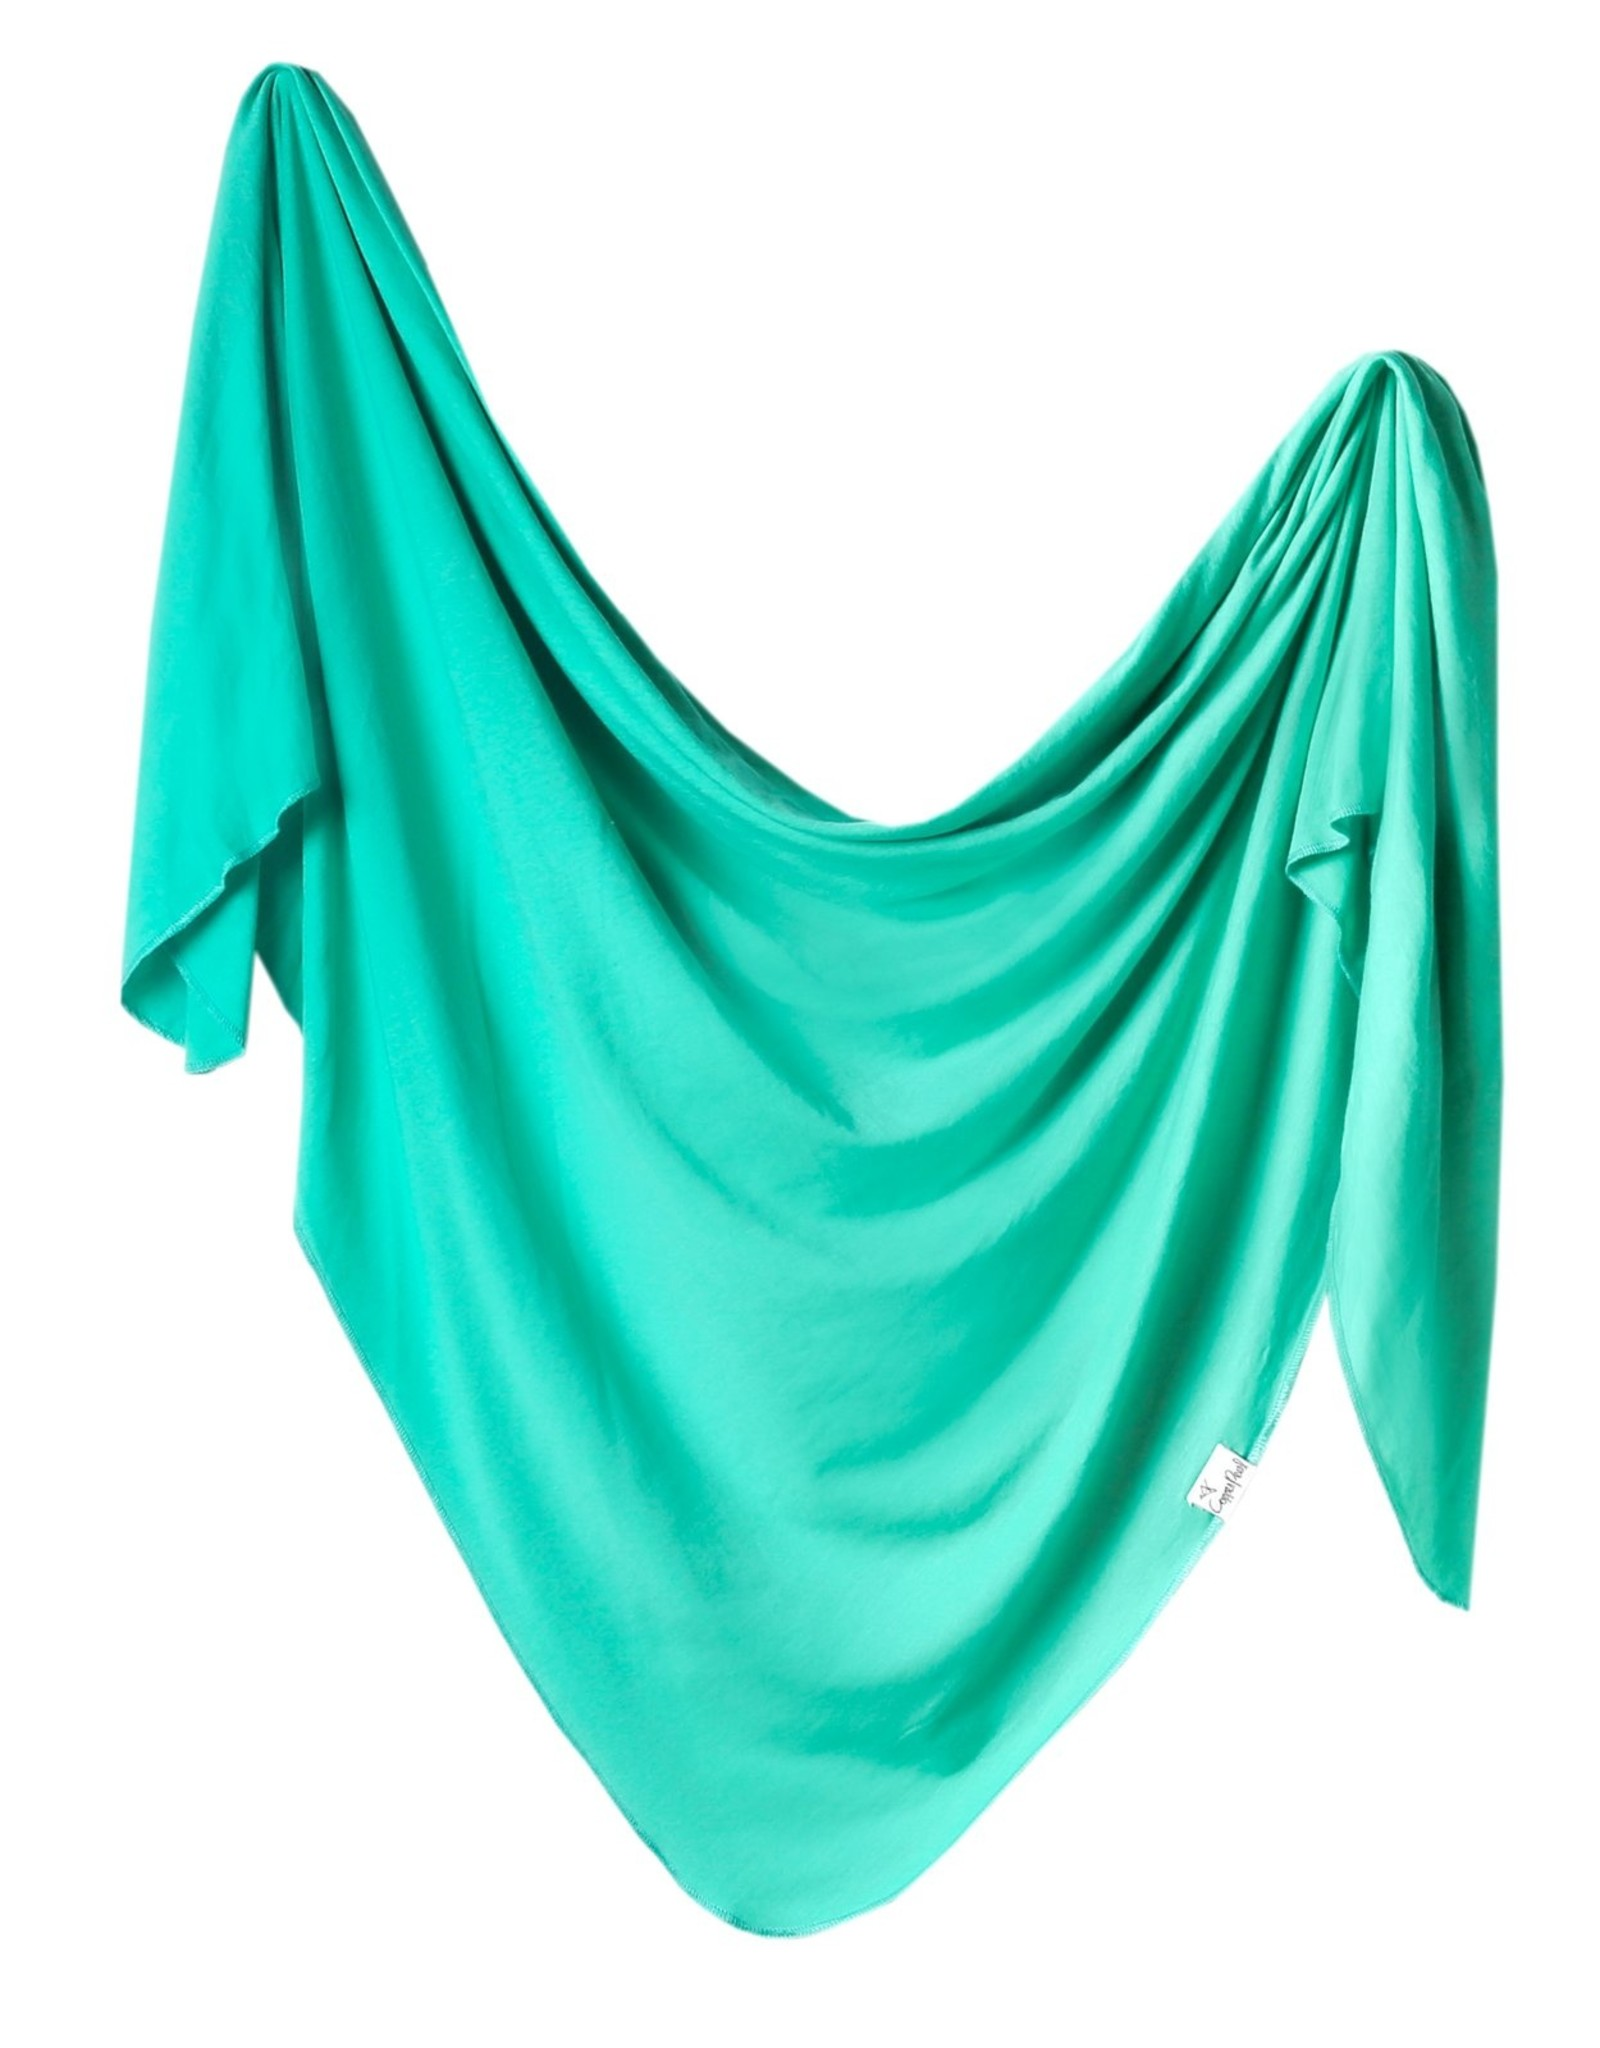 Copper Pearl Spout Swaddle Blanket Copper Pearl